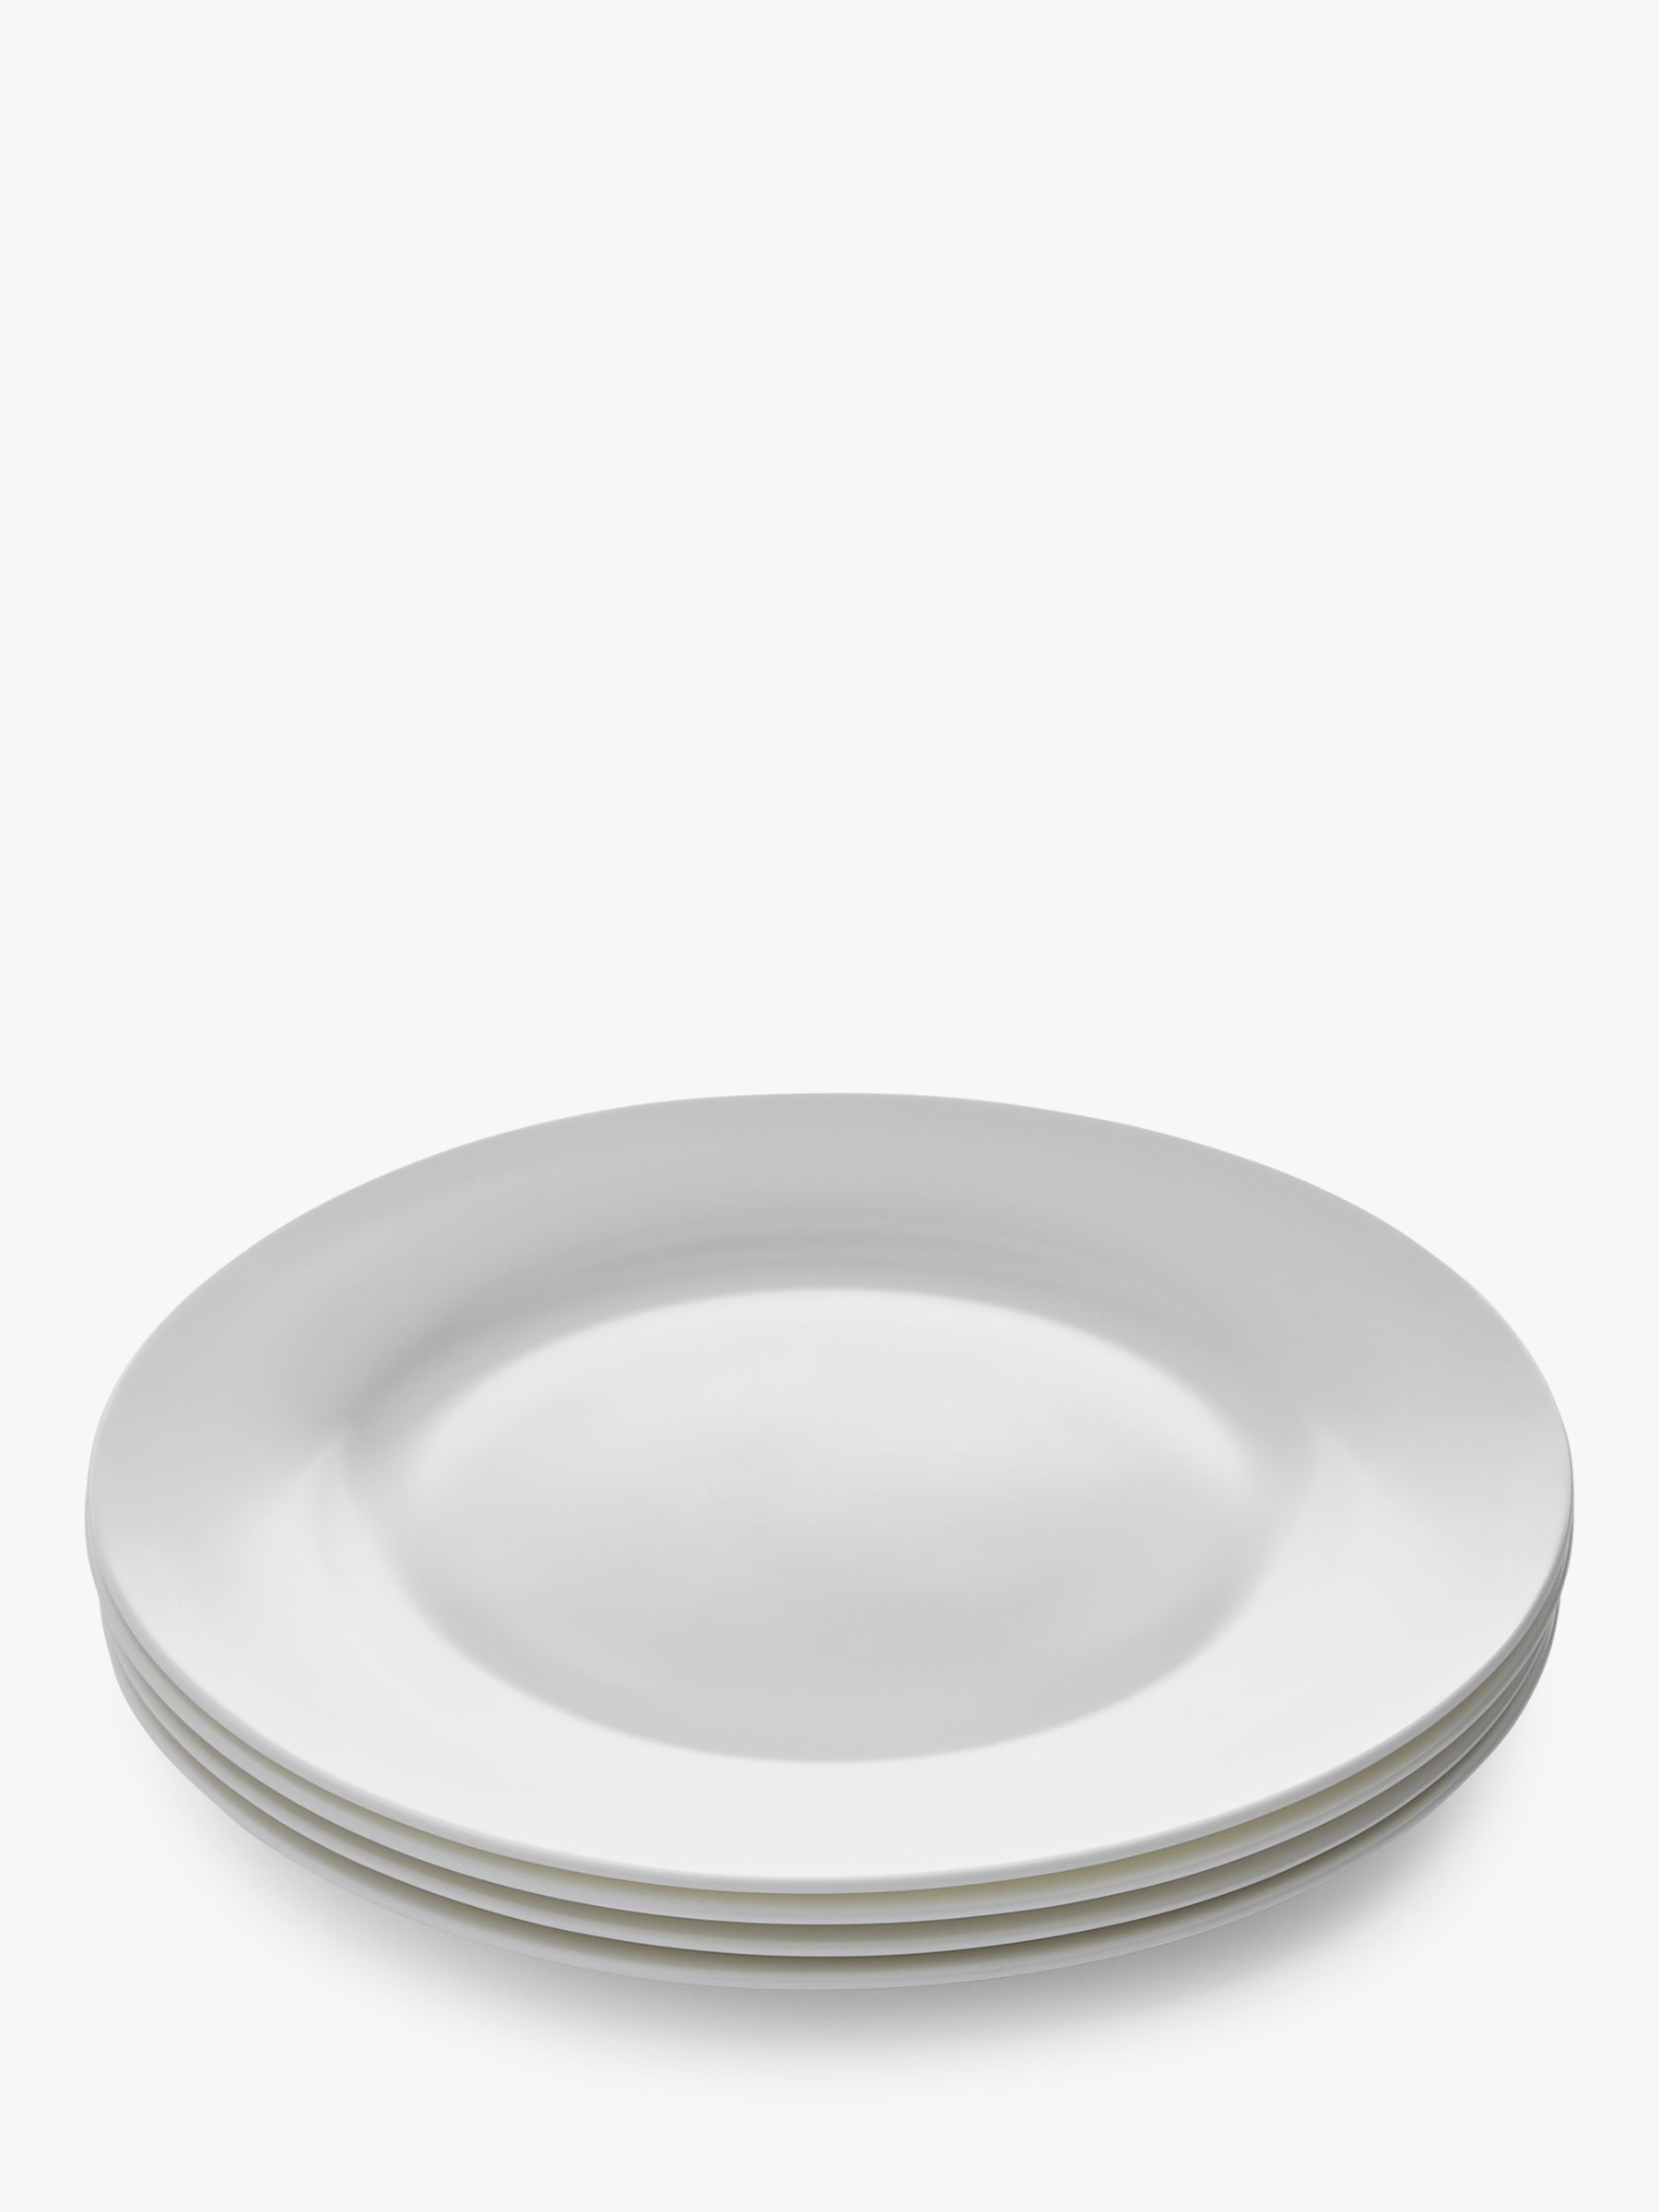 Royal Worcester Royal Worcester Serendipity Bone China Dinner Plates, 27cm, Set of 4, White